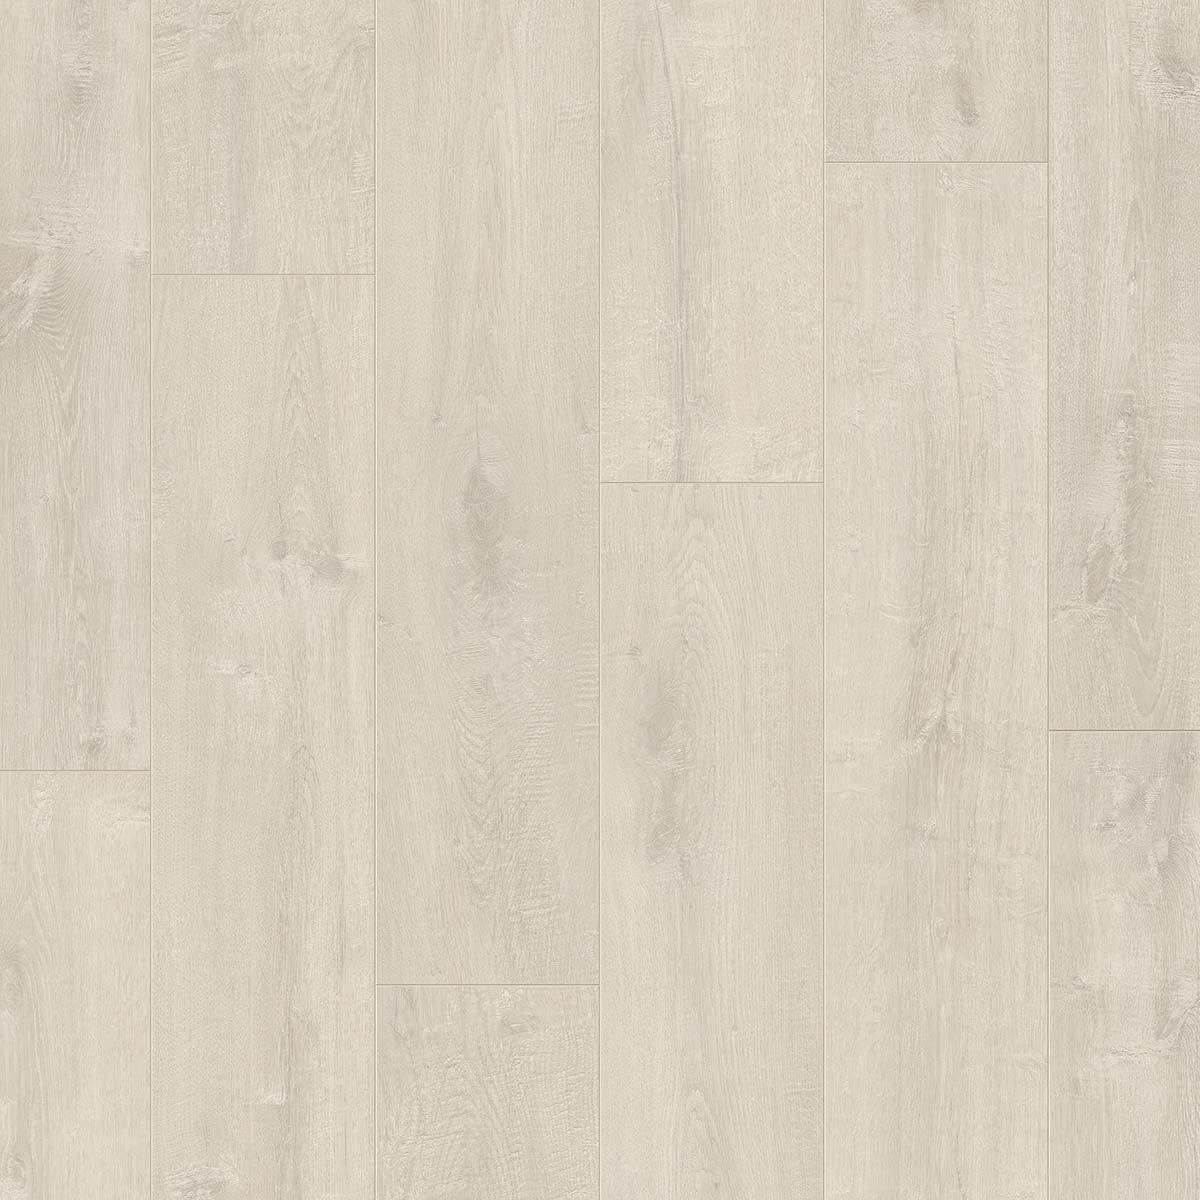 Quickstep Balance Glue Plus Vinyl Flooring - Velvet Oak Light - 0